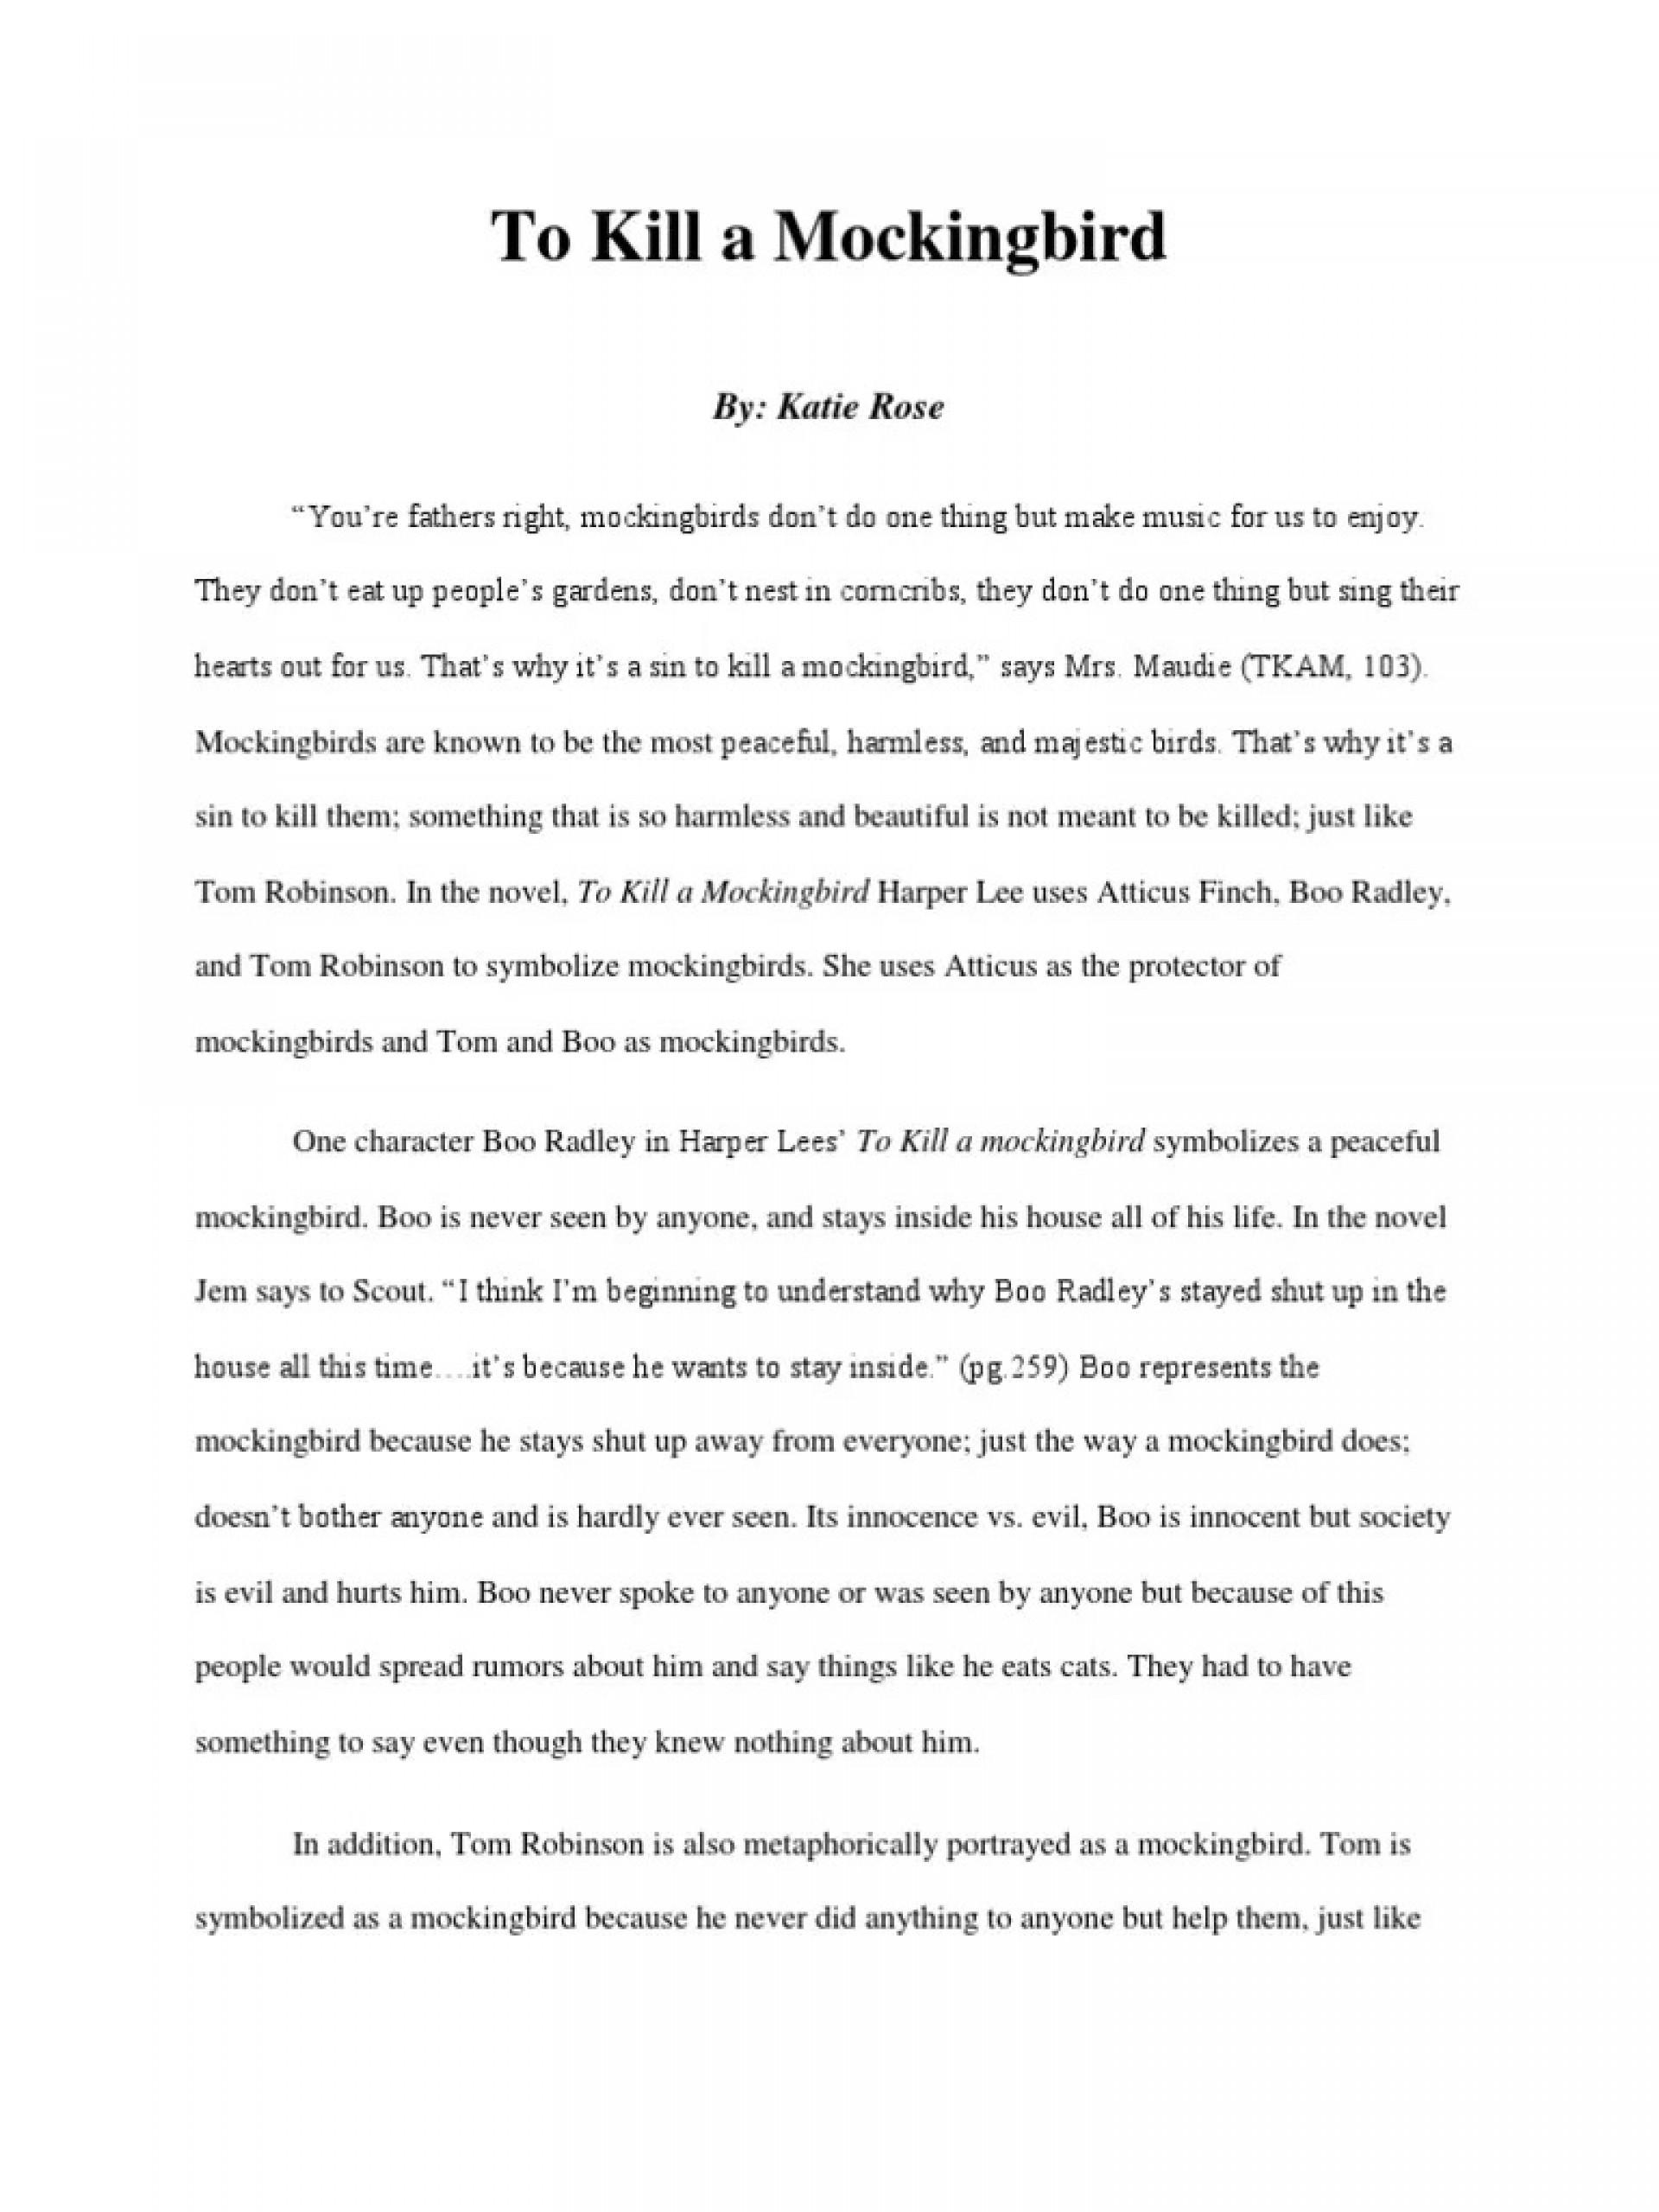 007 Breathtaking To Kill A Mockingbird Essay Highest Quality  Question Courage Thesi Pdf1920